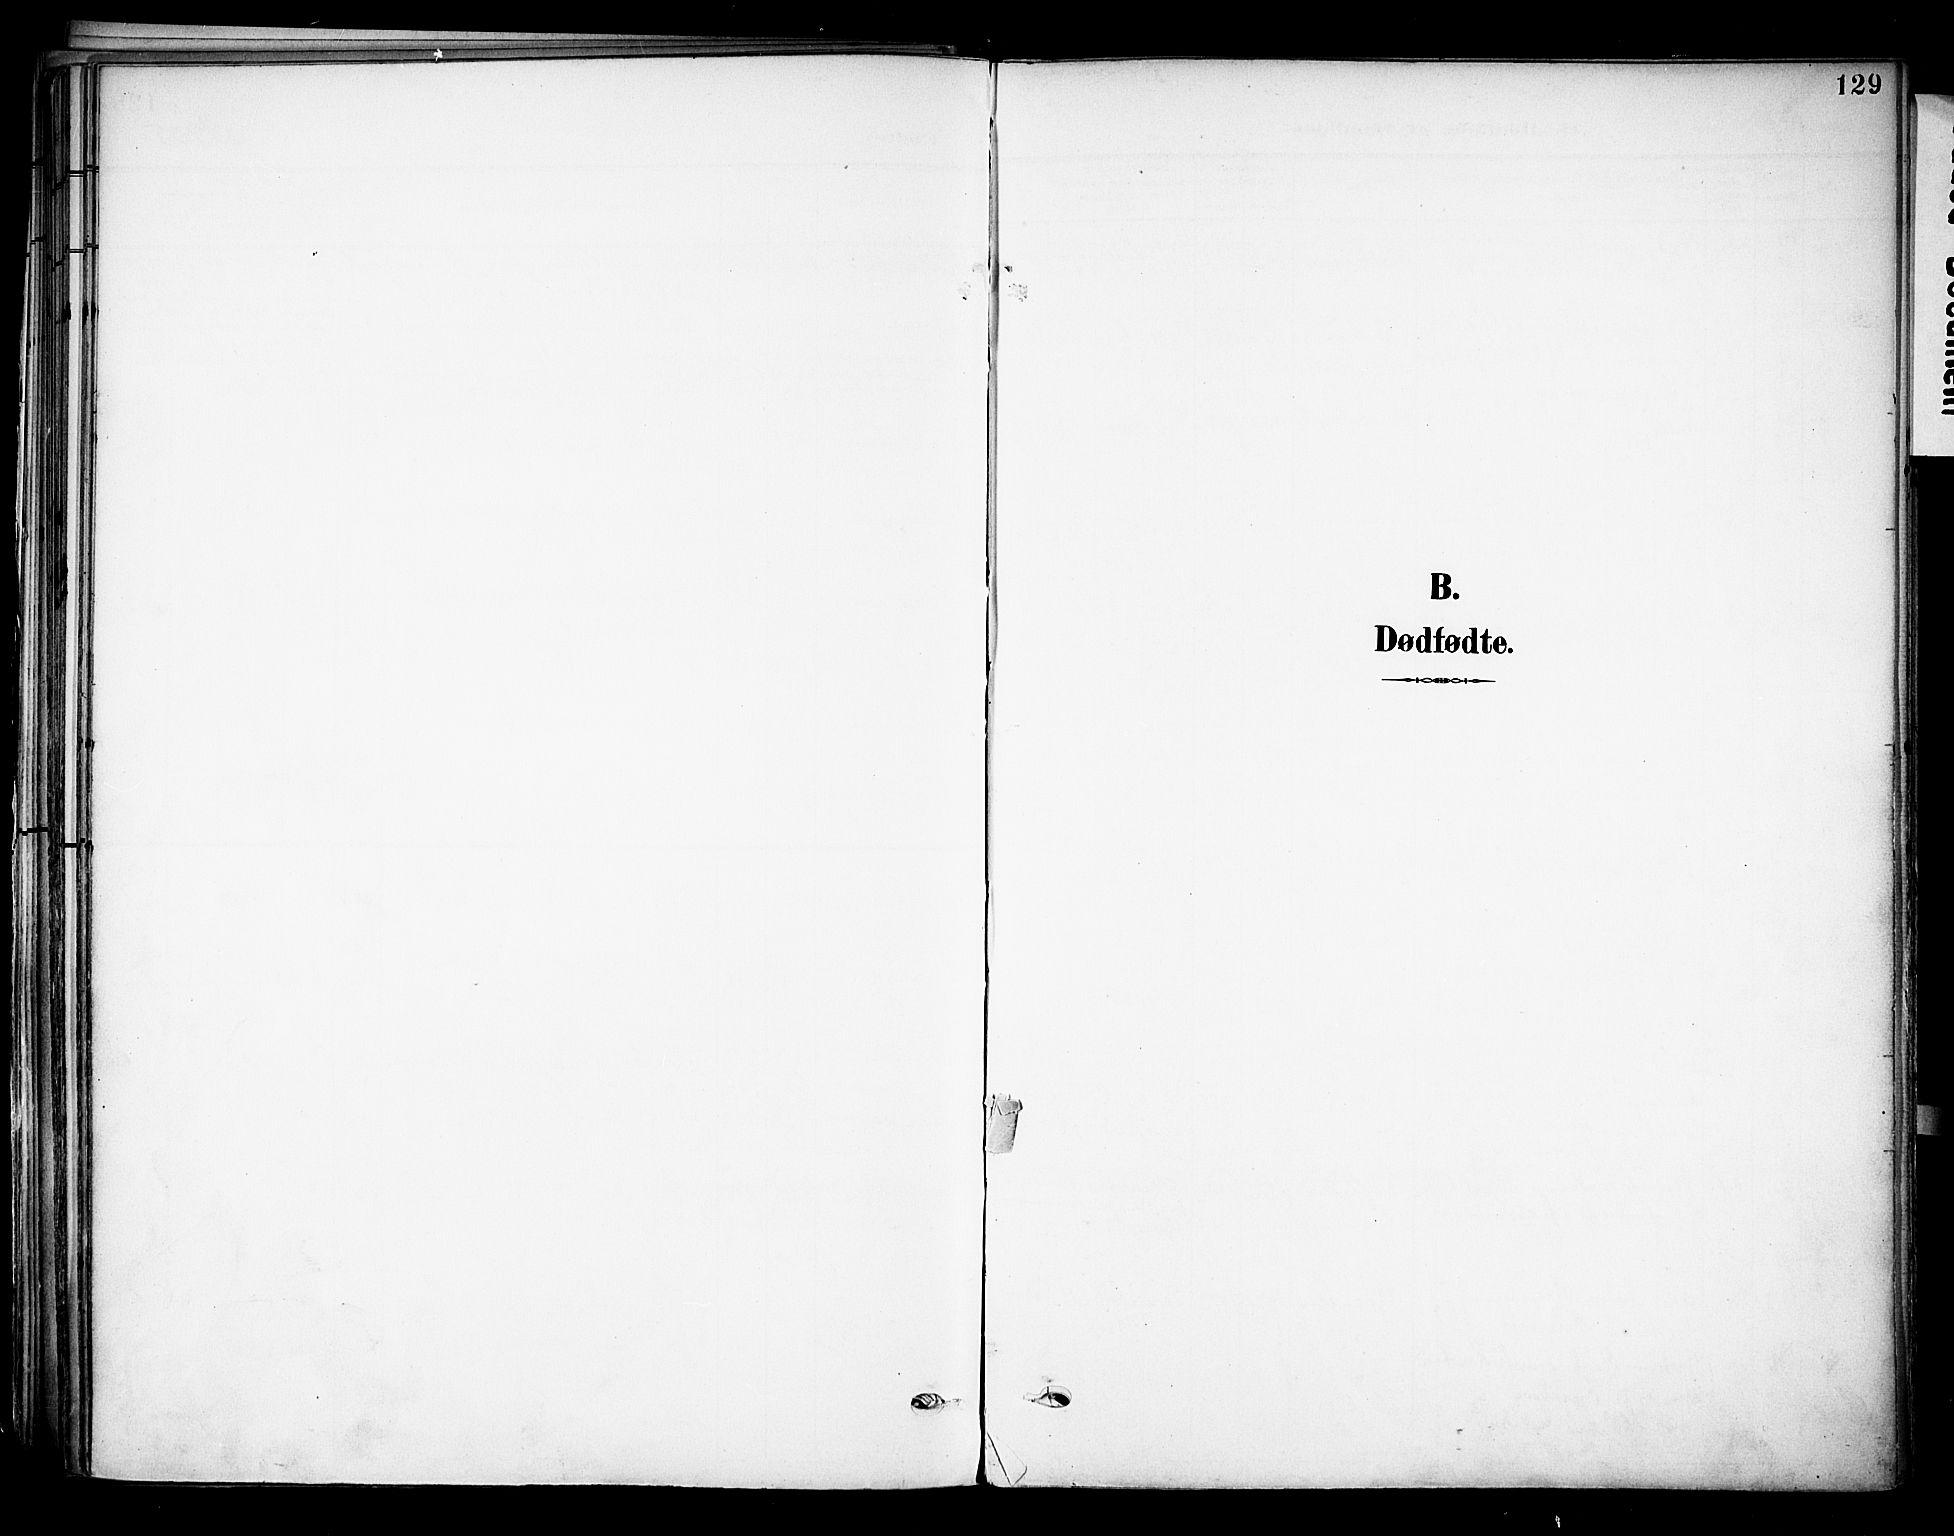 SAKO, Solum kirkebøker, F/Fa/L0011: Ministerialbok nr. I 11, 1898-1909, s. 129